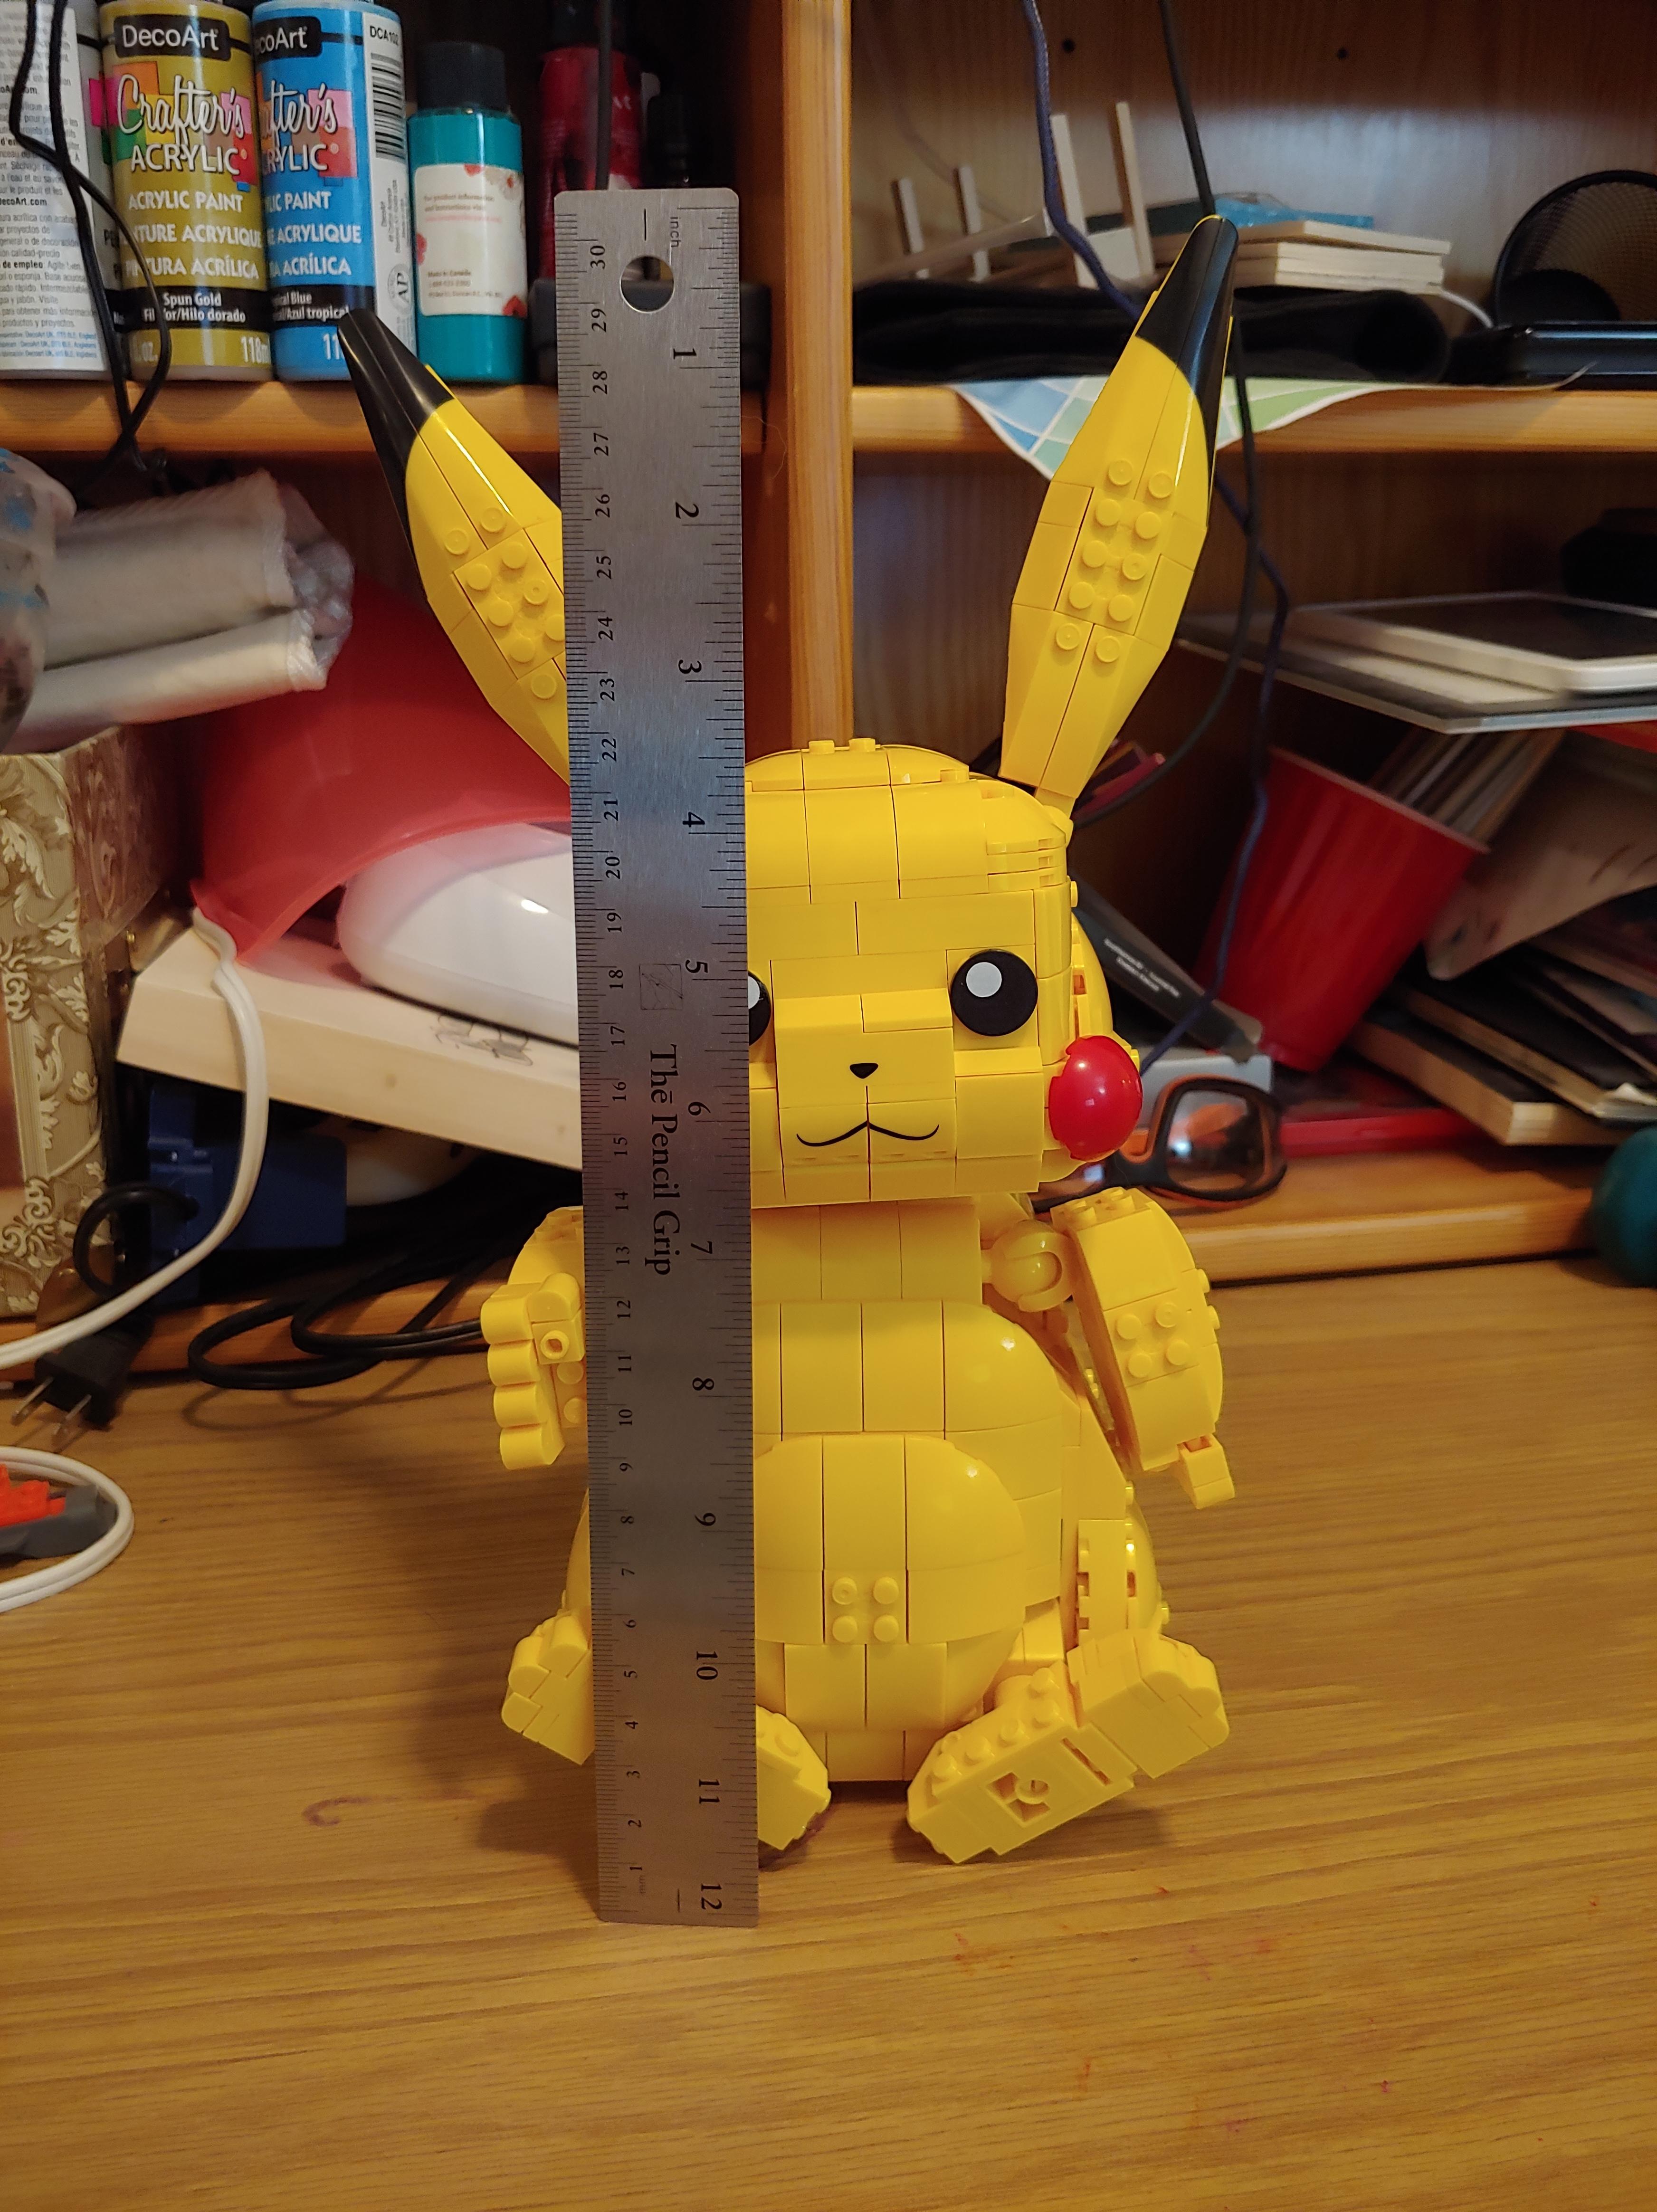 Mega Construx Pokemon Jumbo Pikachu Building Set reviews in Building